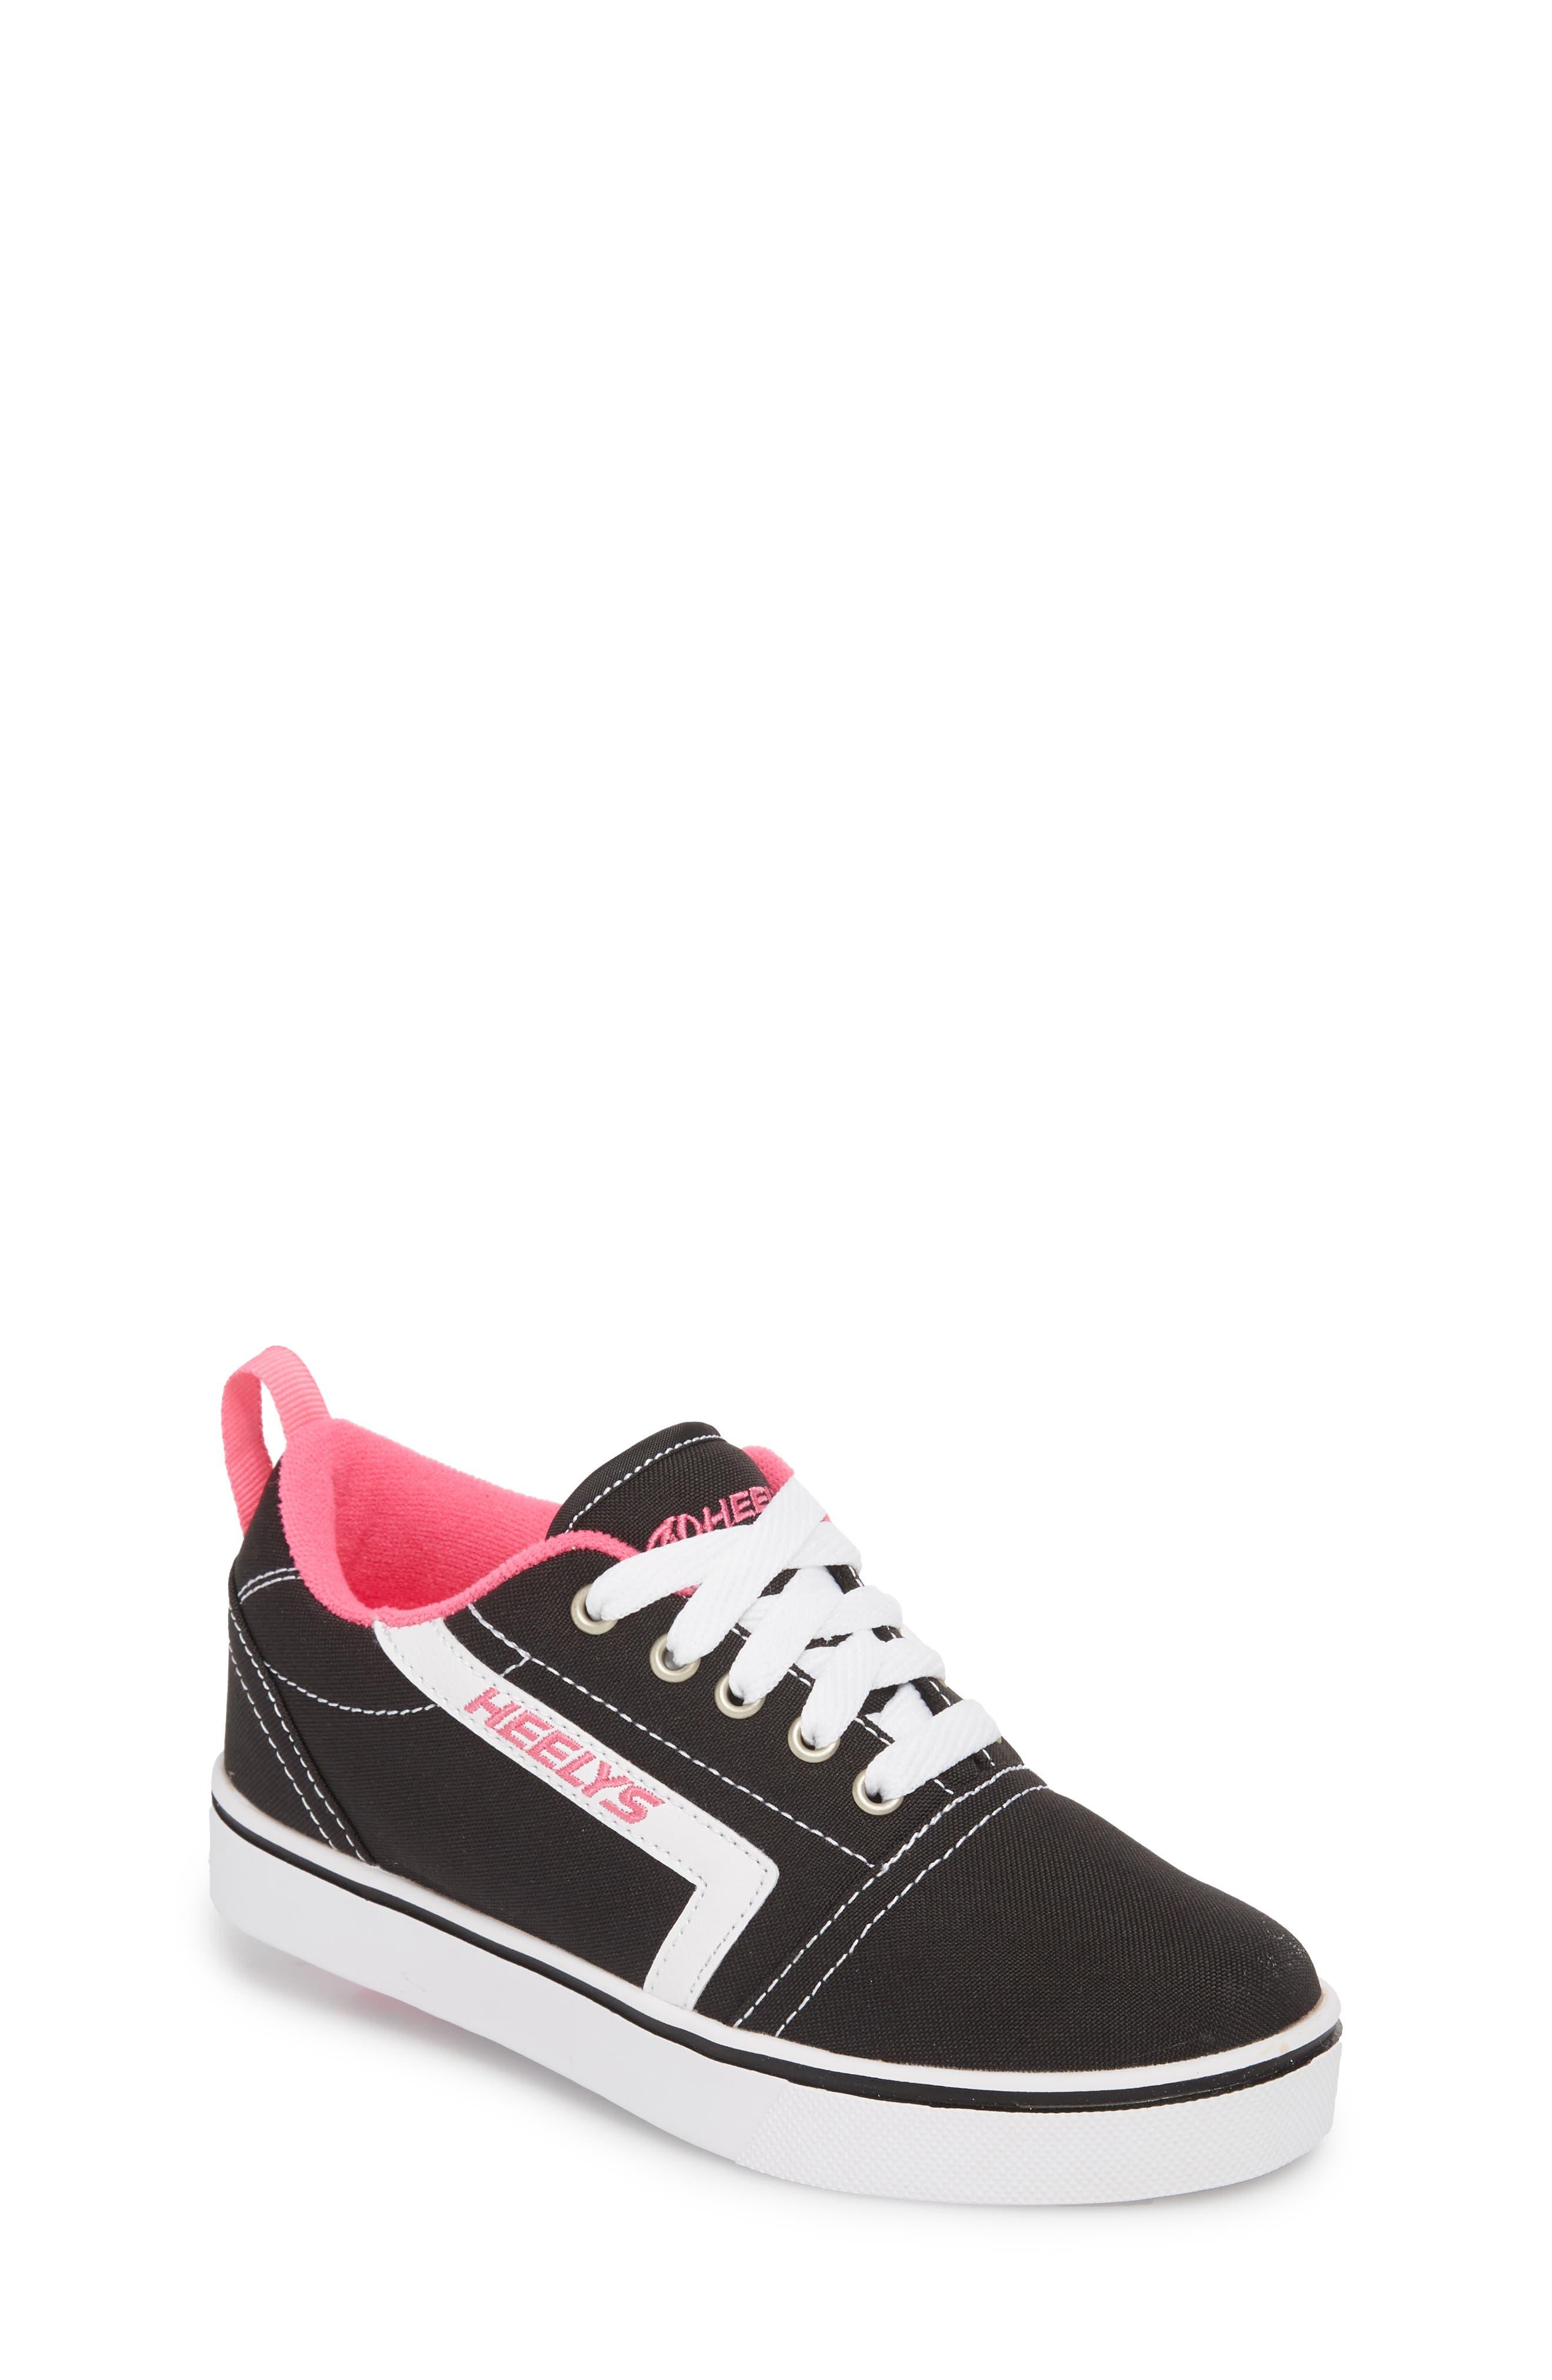 GR8 Pro Wheeled Sneaker,                             Main thumbnail 1, color,                             002